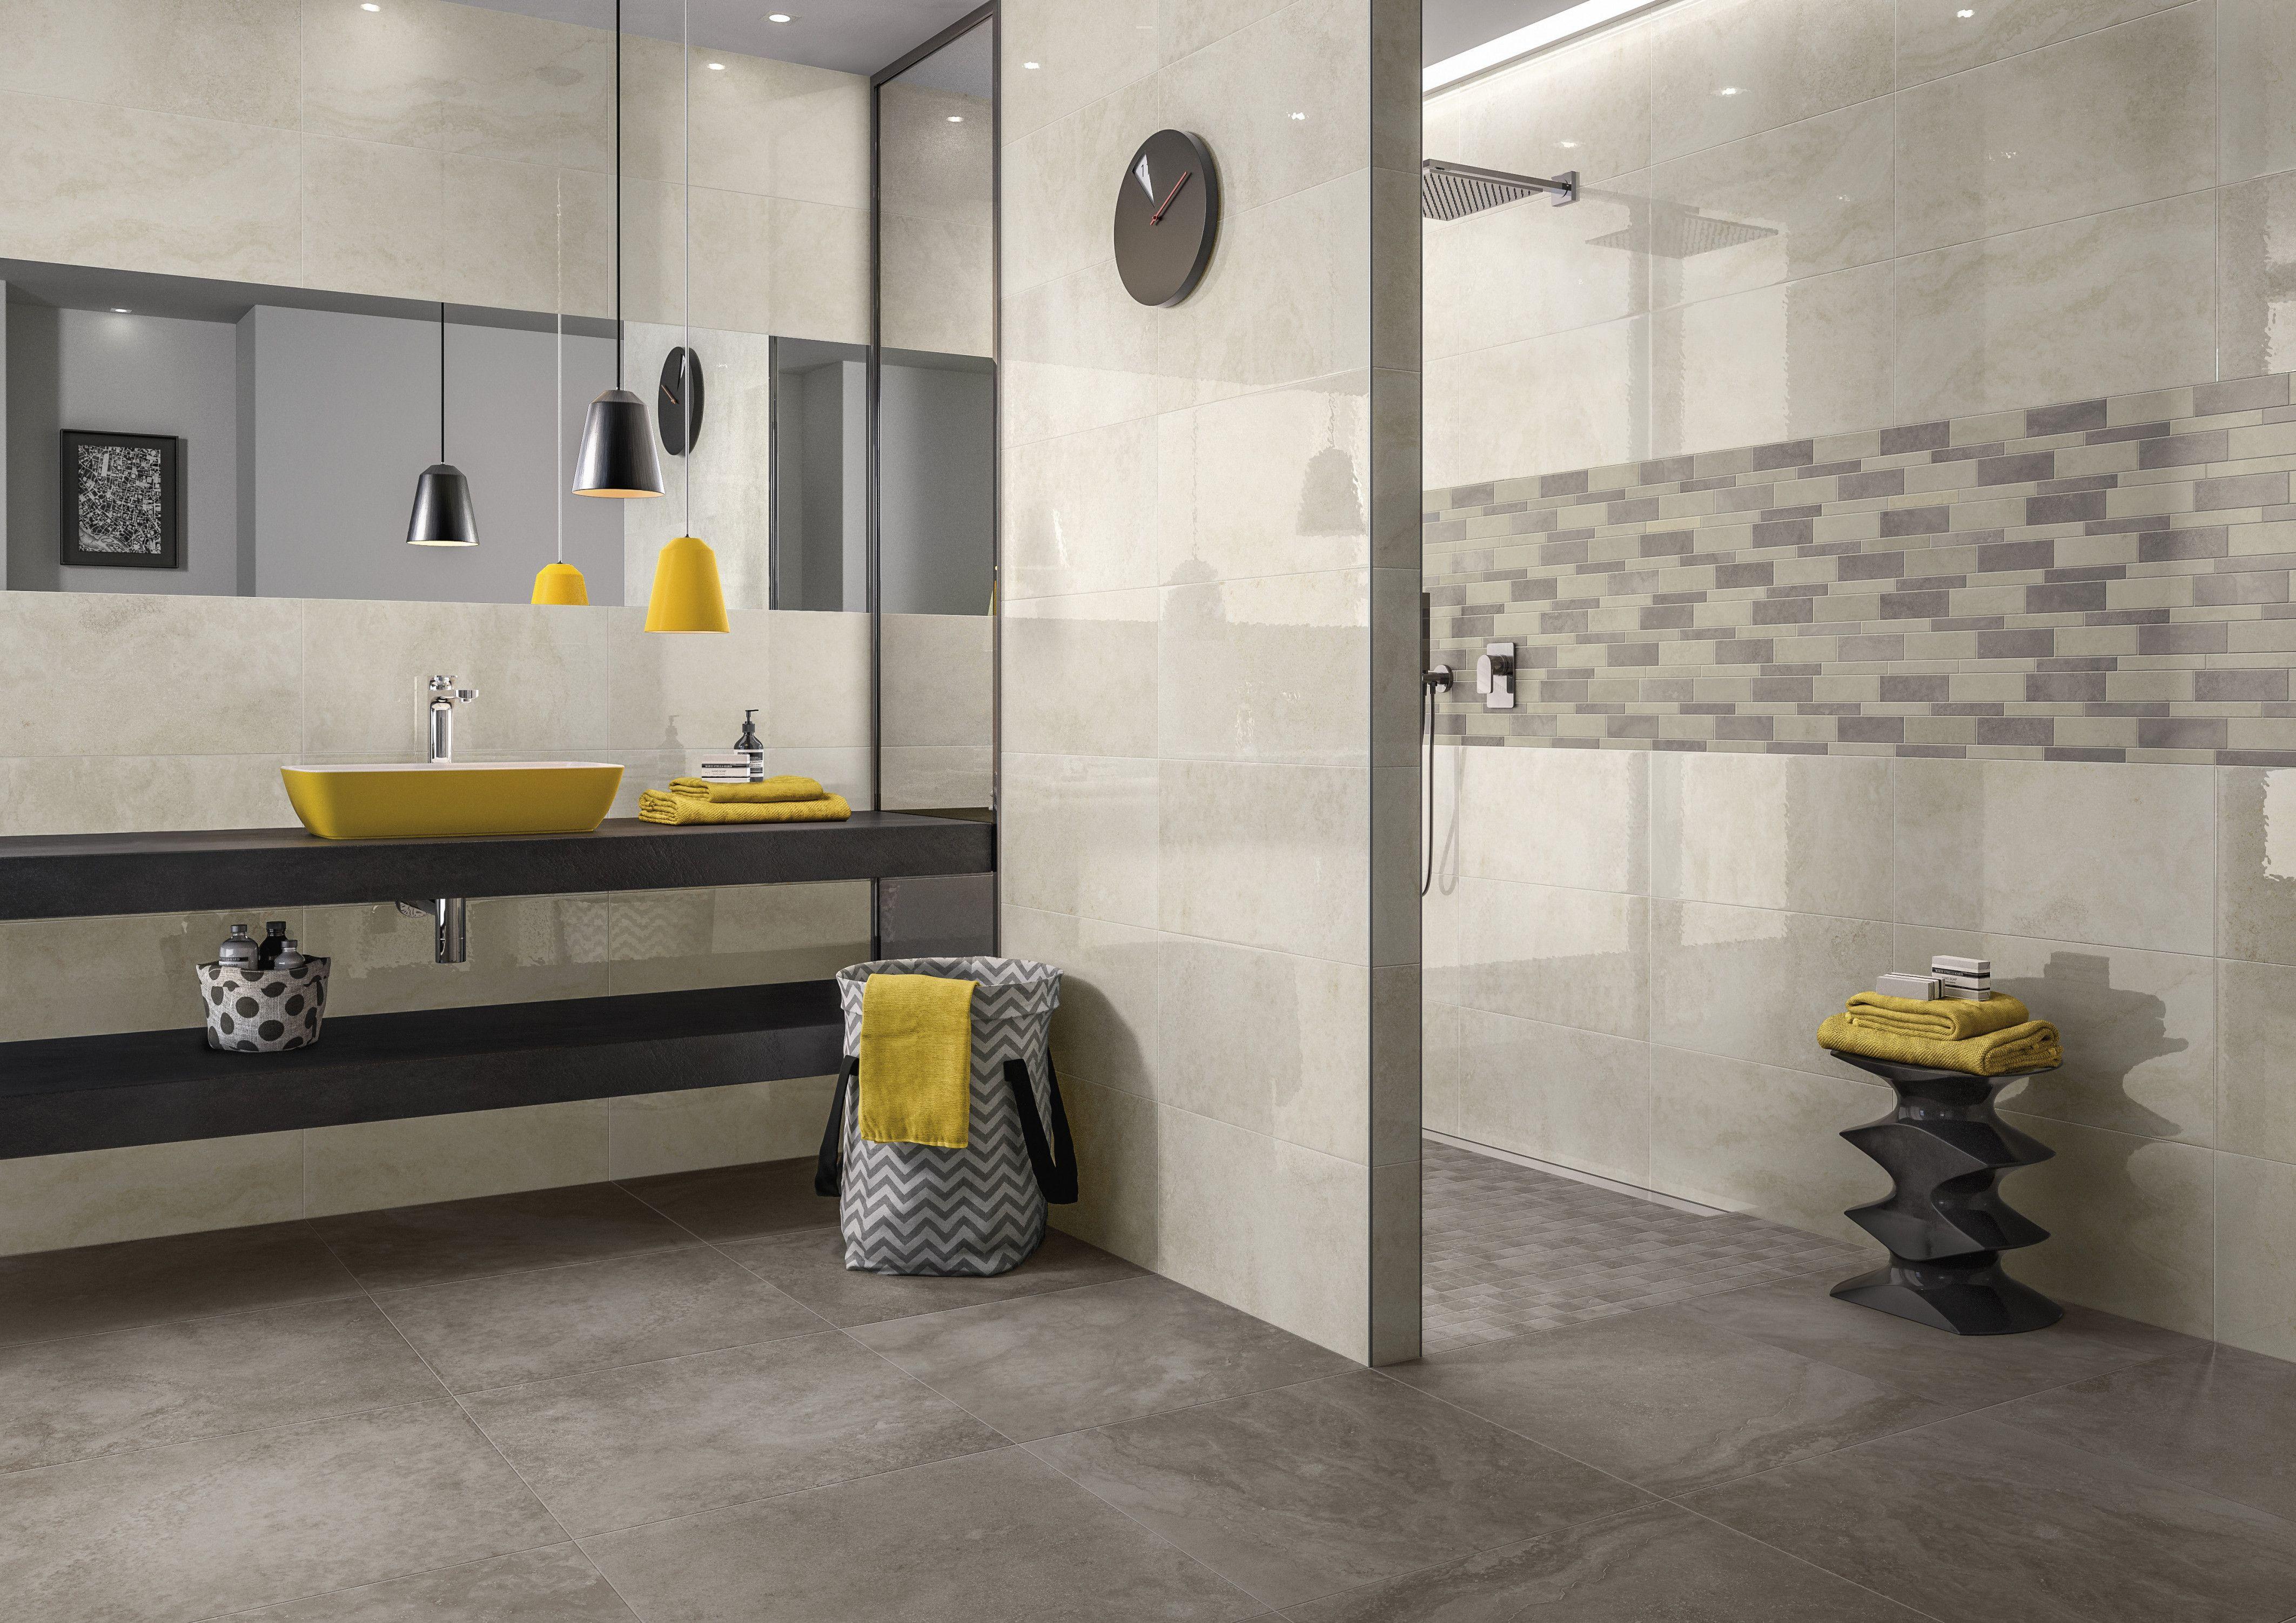 Badezimmertrends 2020 Badezimmer Trends Fliesen